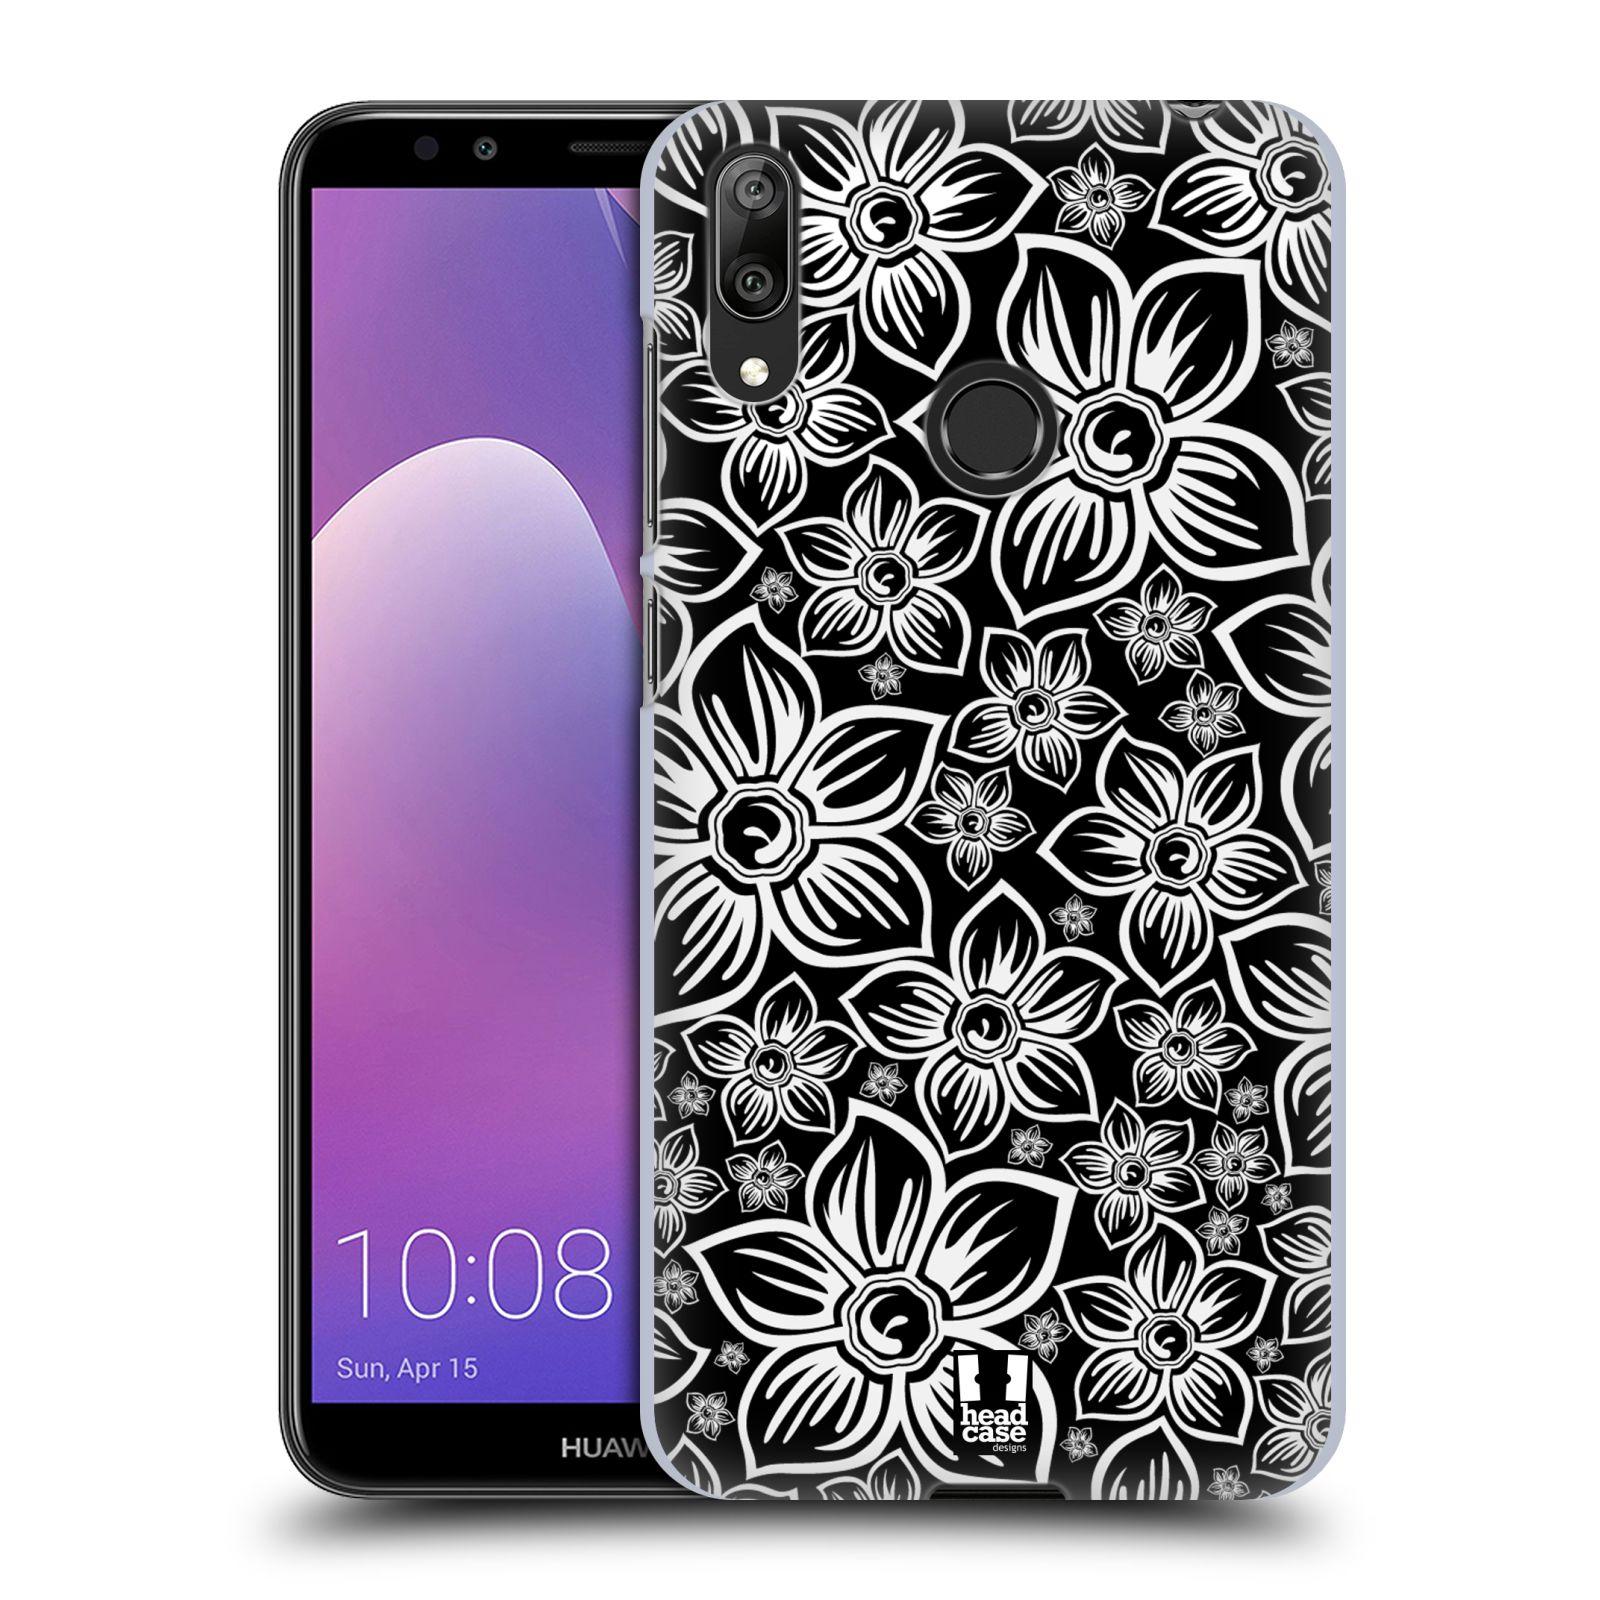 Plastové pouzdro na mobil Huawei Y7 (2019) - Head Case - FLORAL DAISY